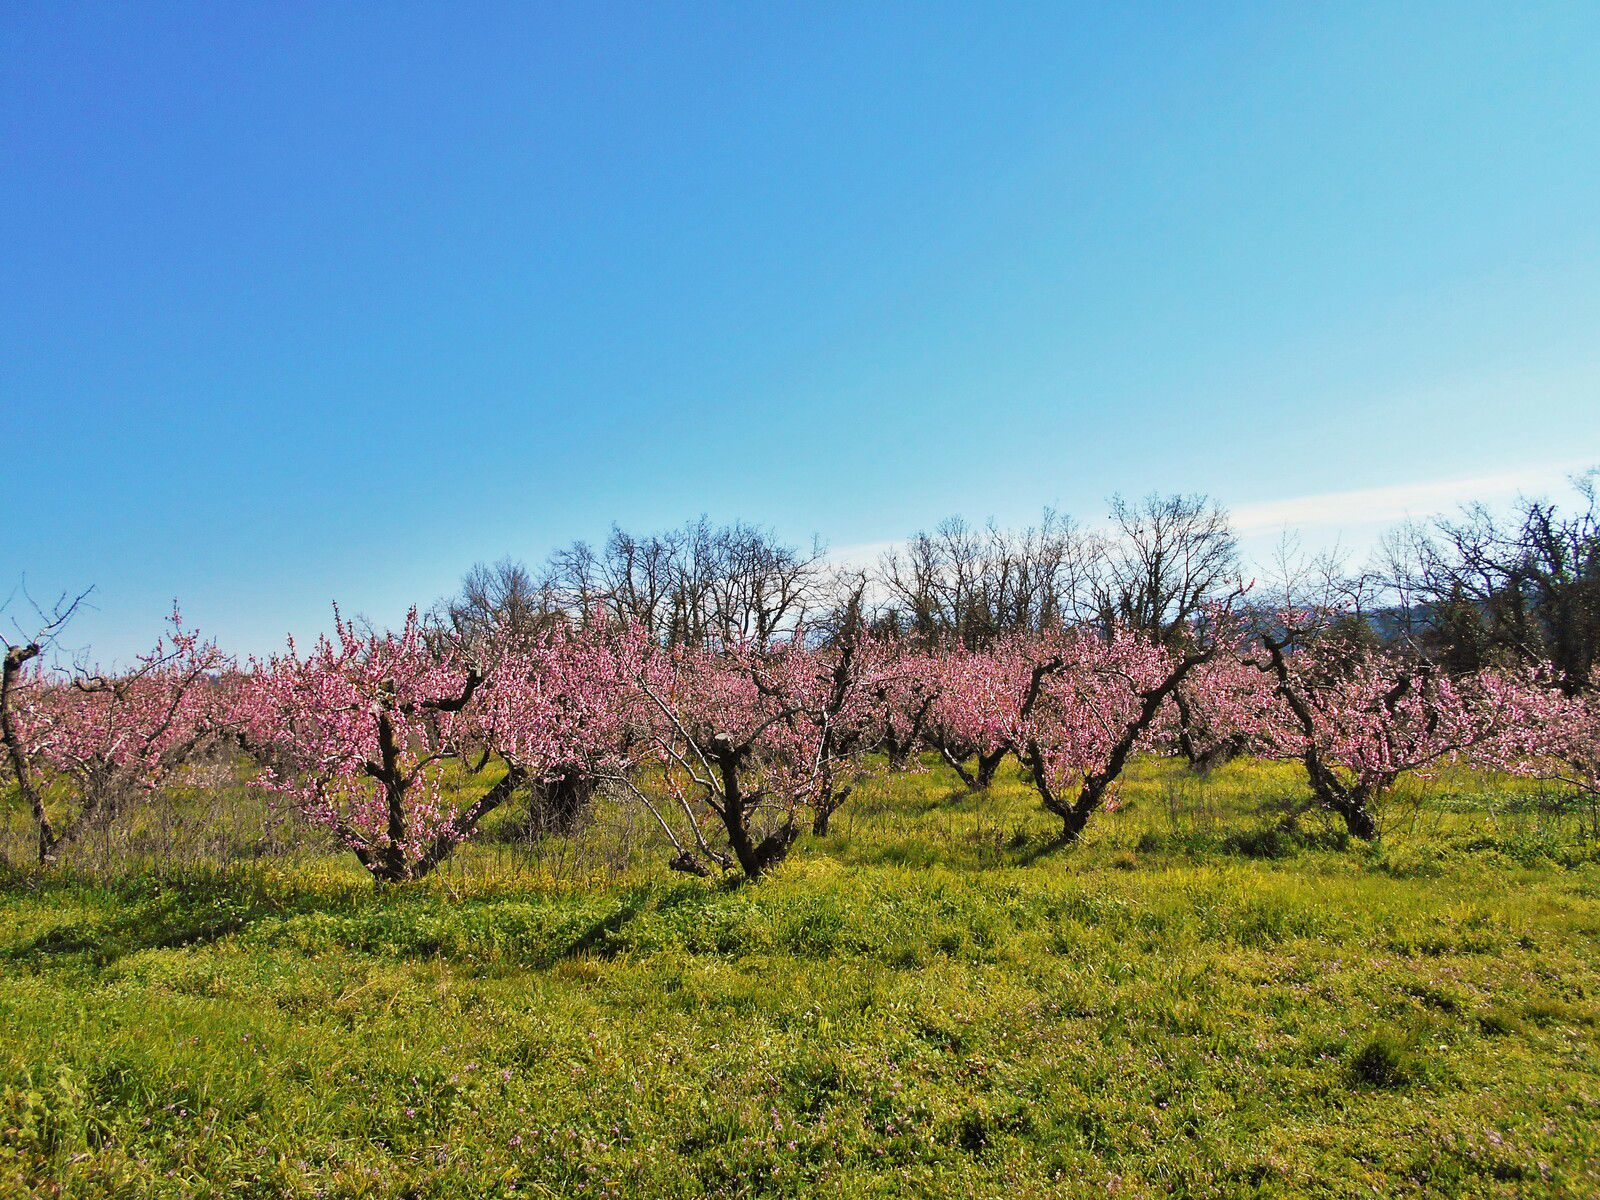 arbres fruitiers en fleurs, pêchers.